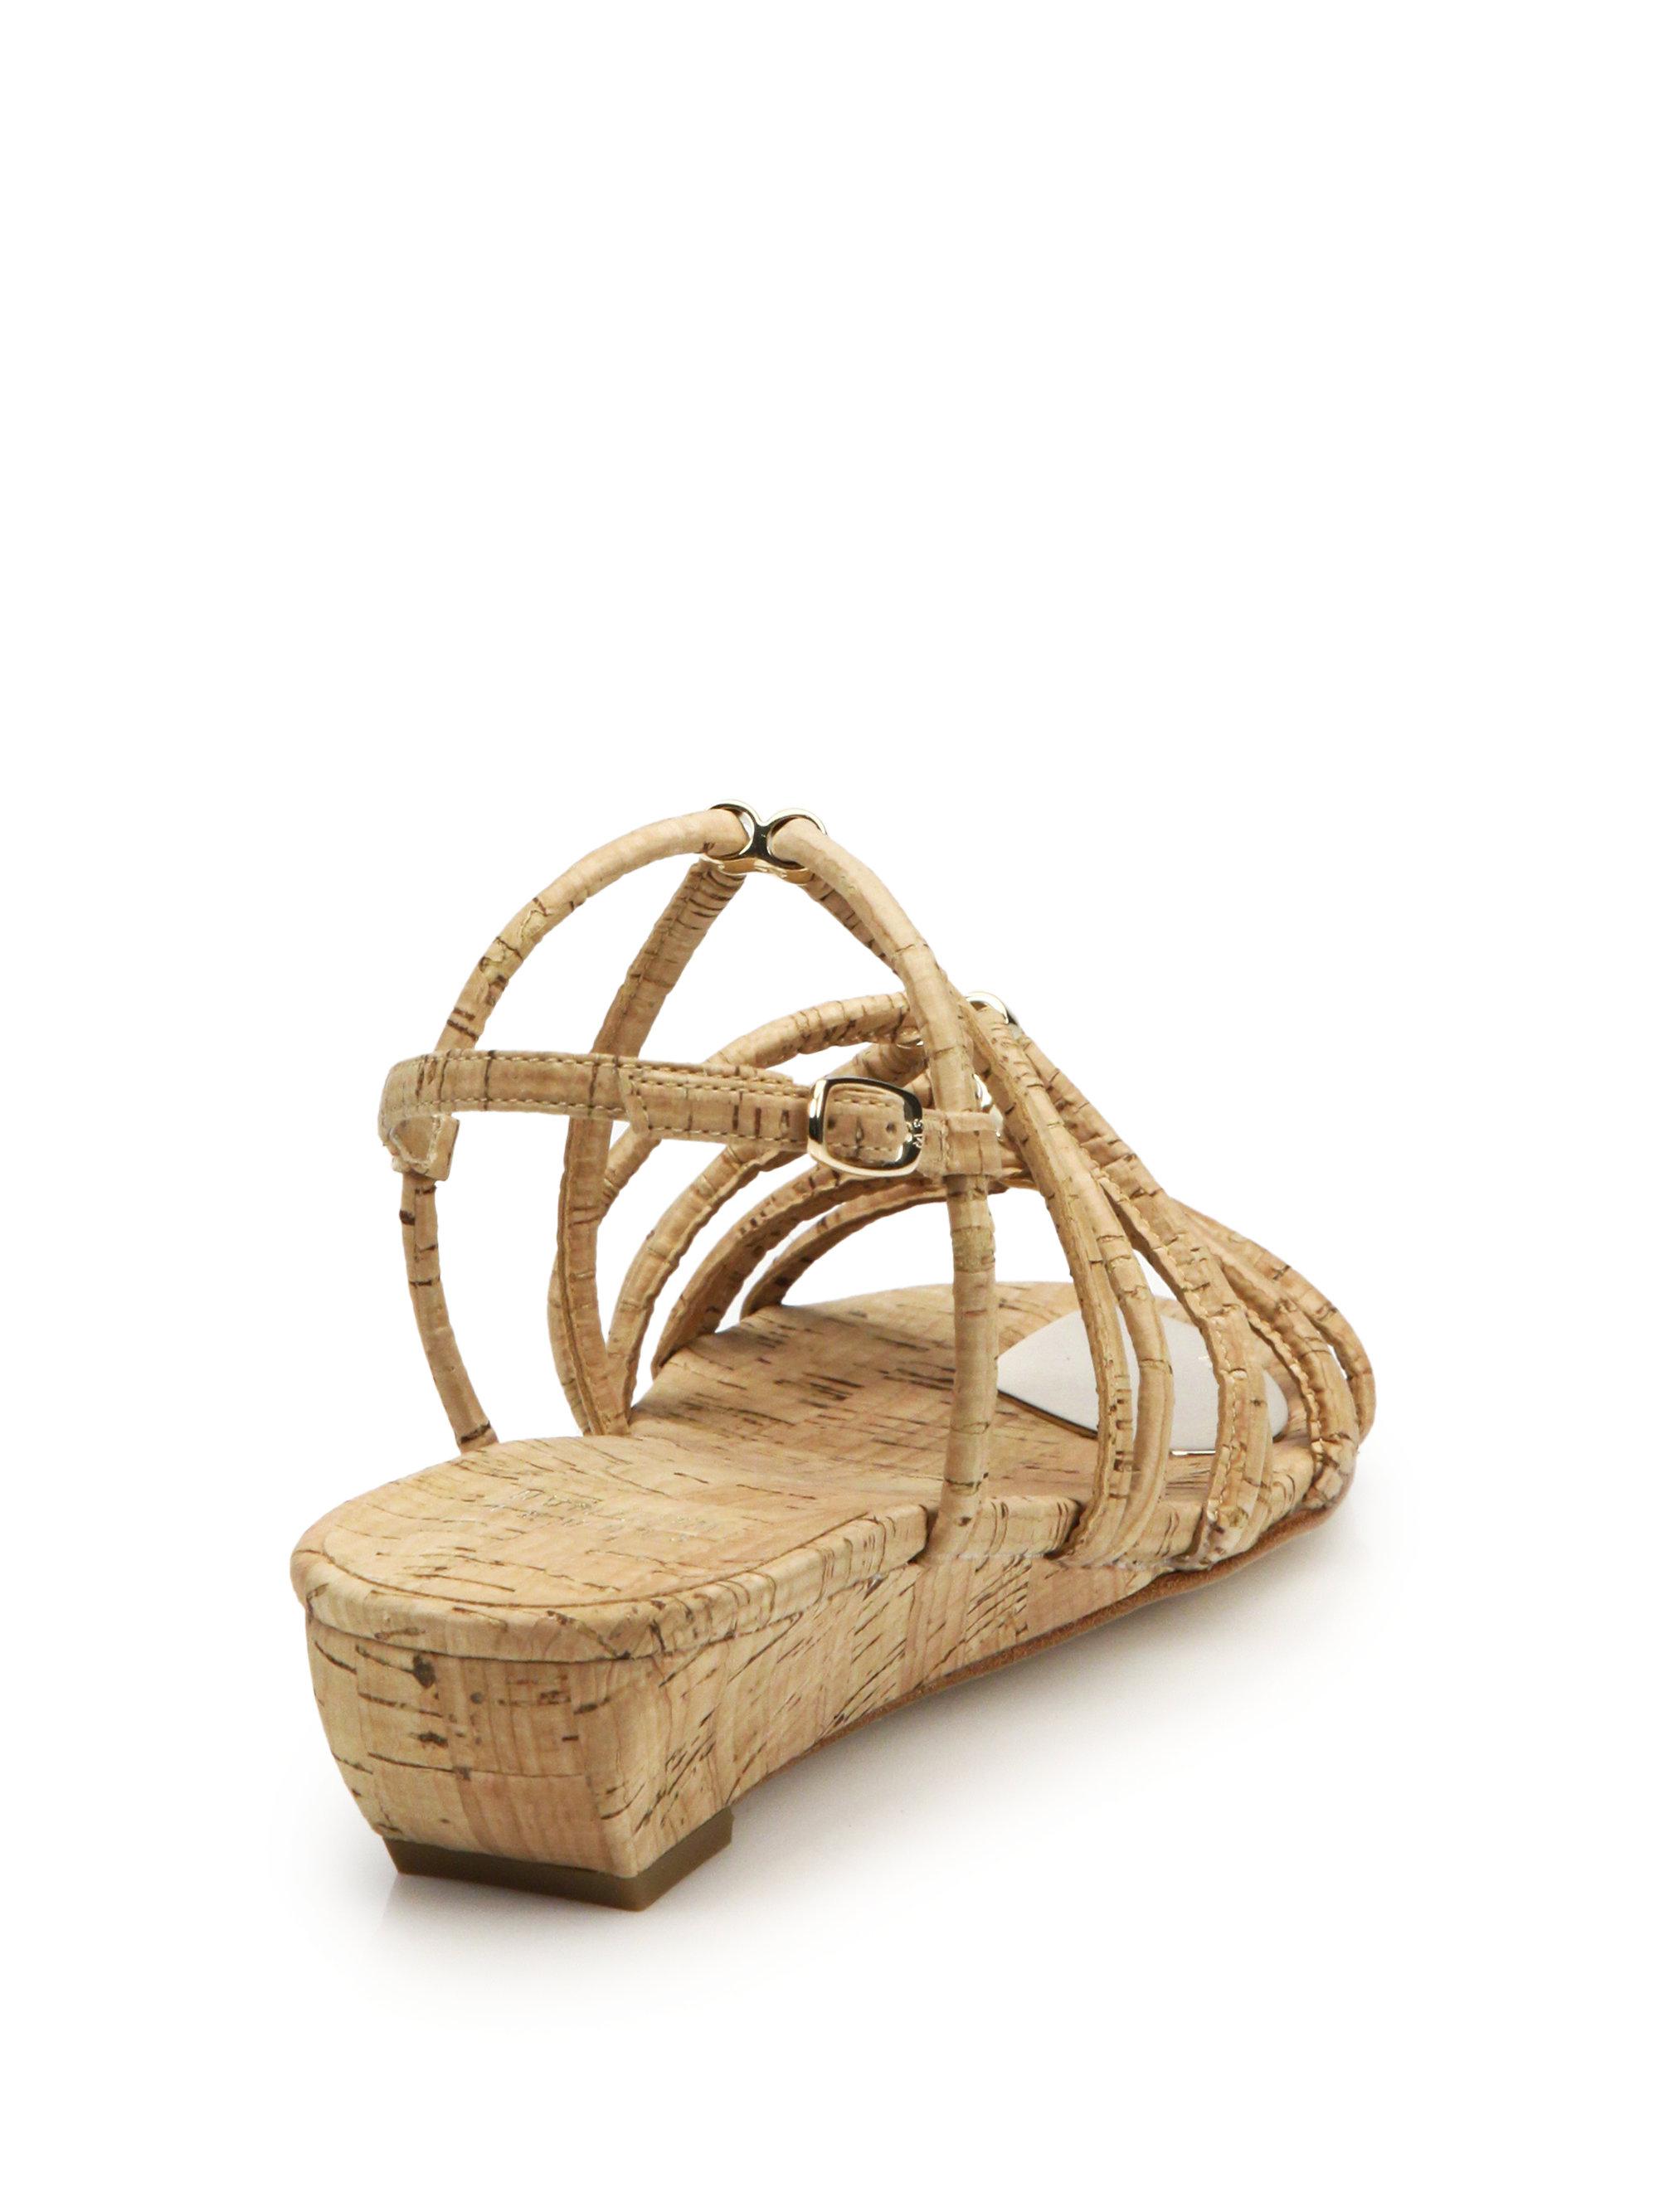 stuart weitzman nuts cork wedge sandals in brown lyst